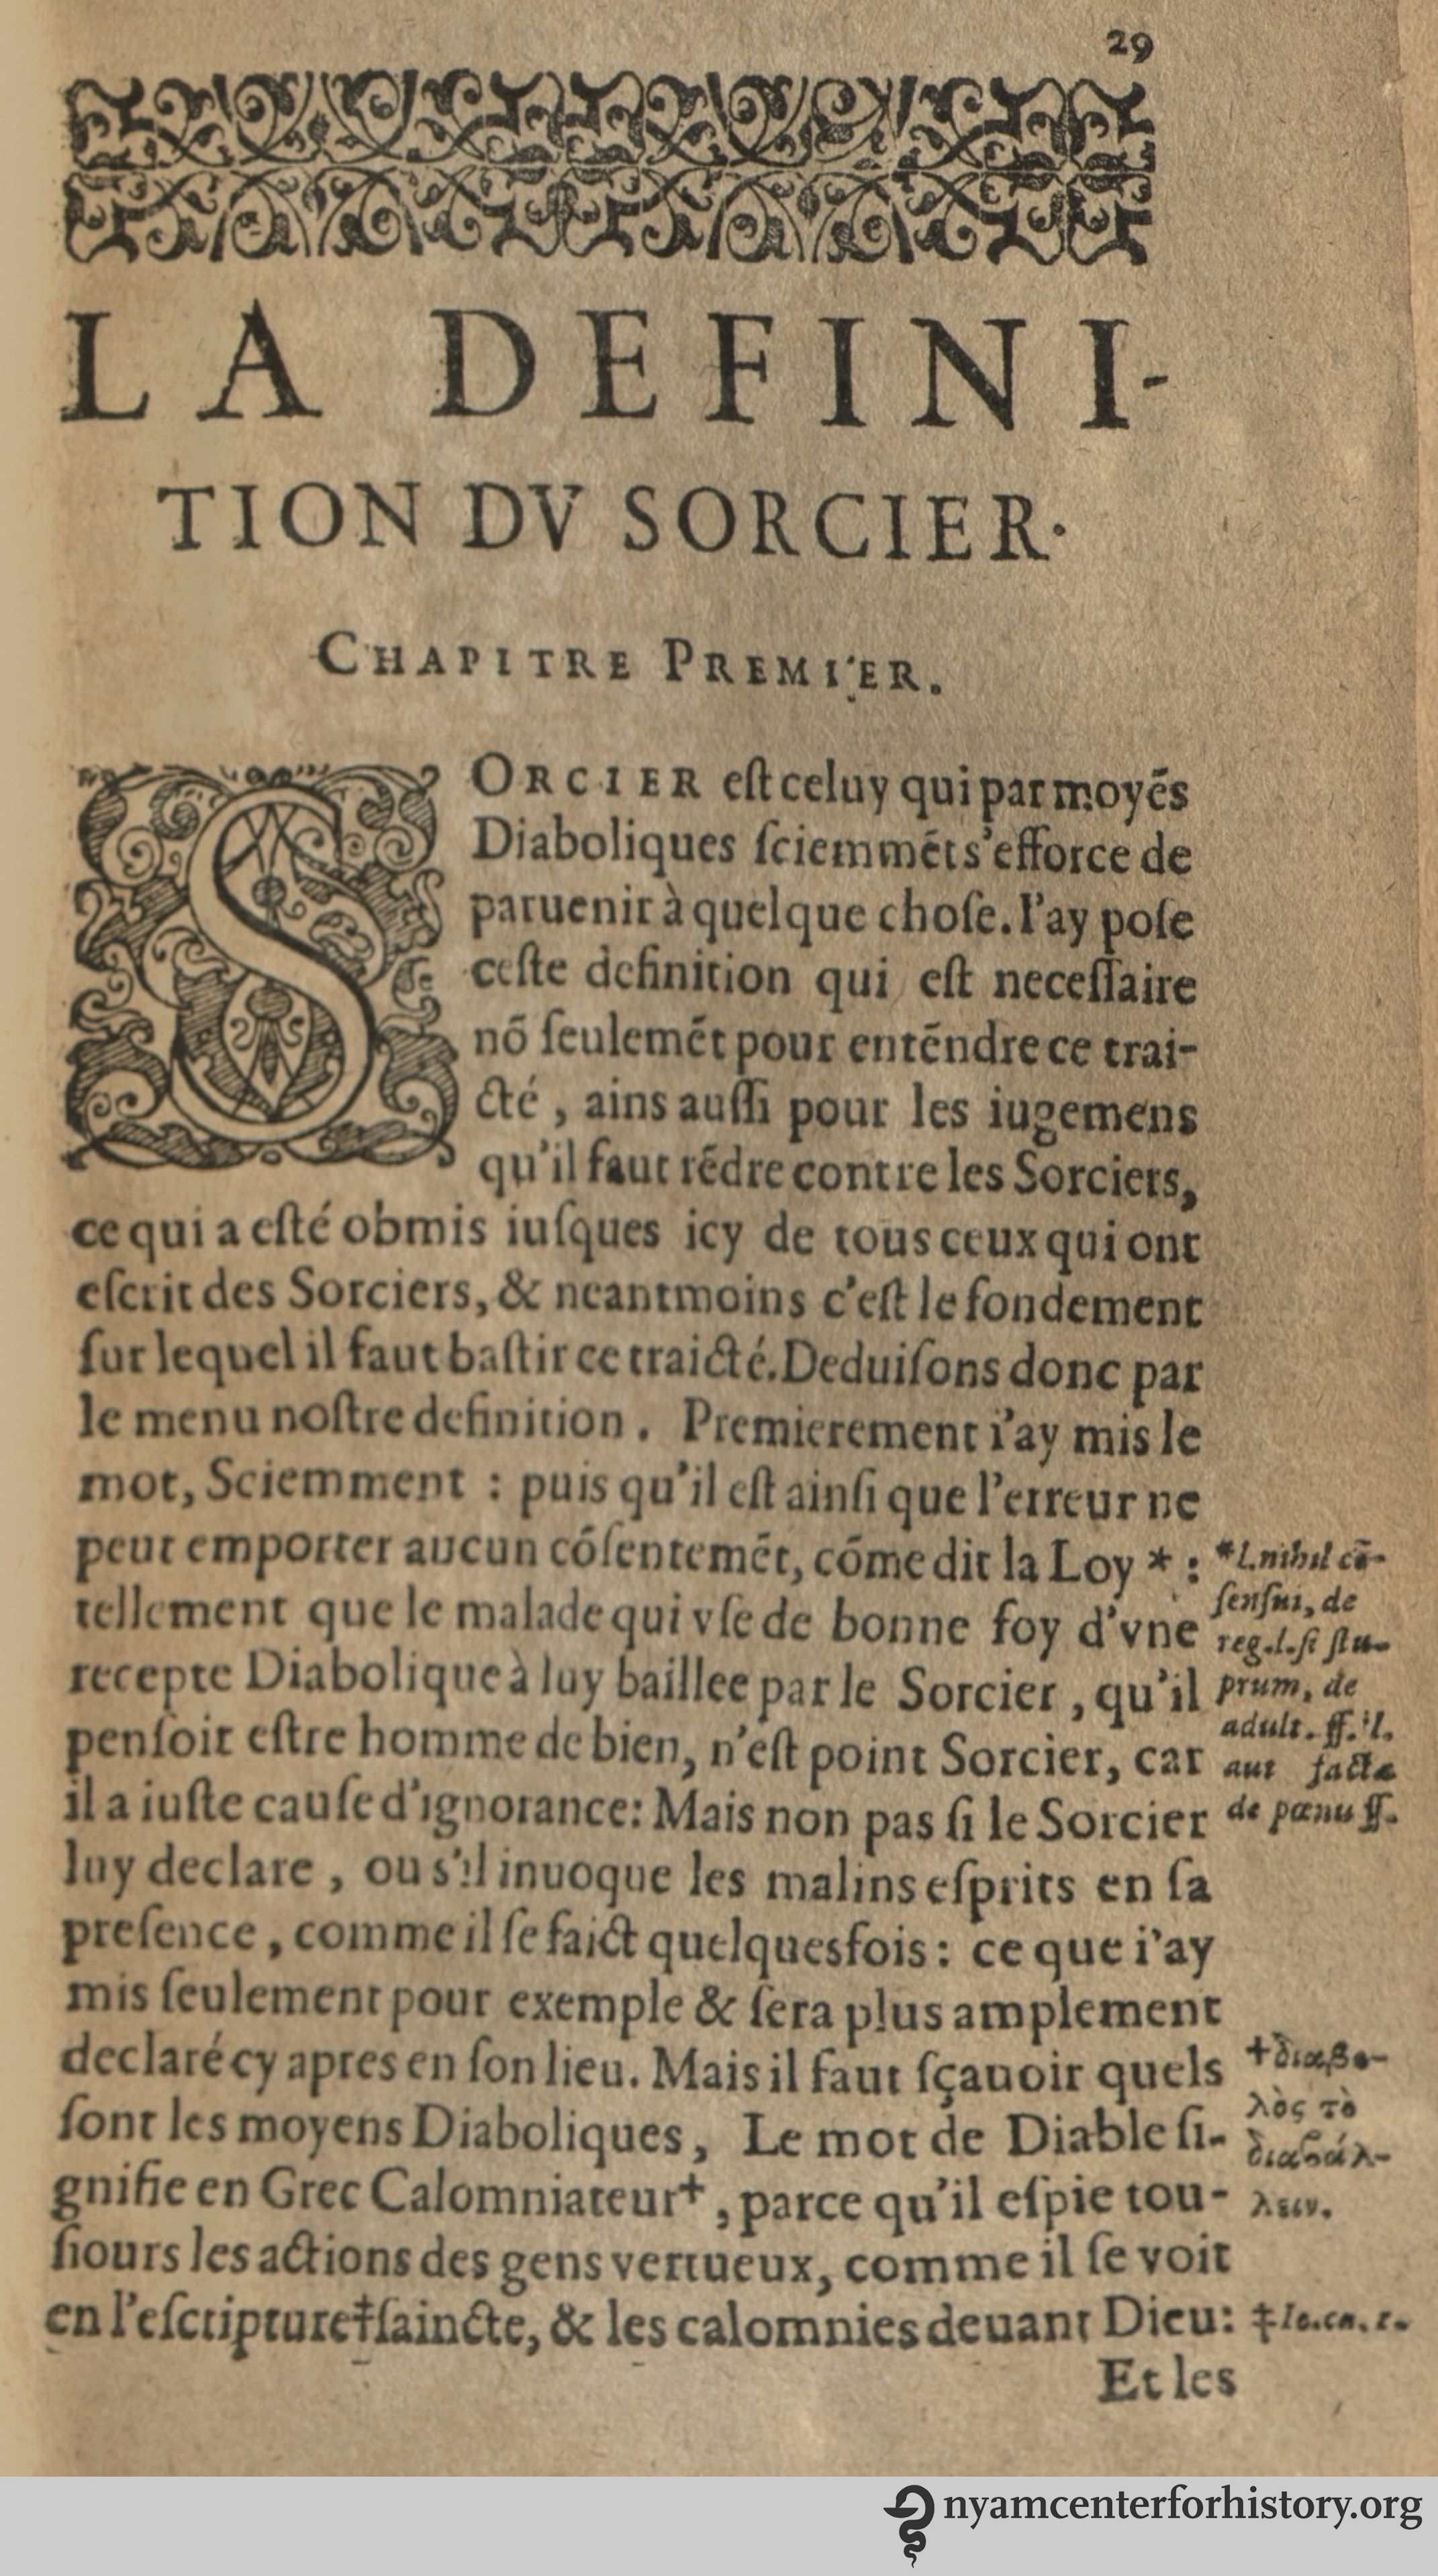 Demonomanie des Sorciers   Books, Health and History